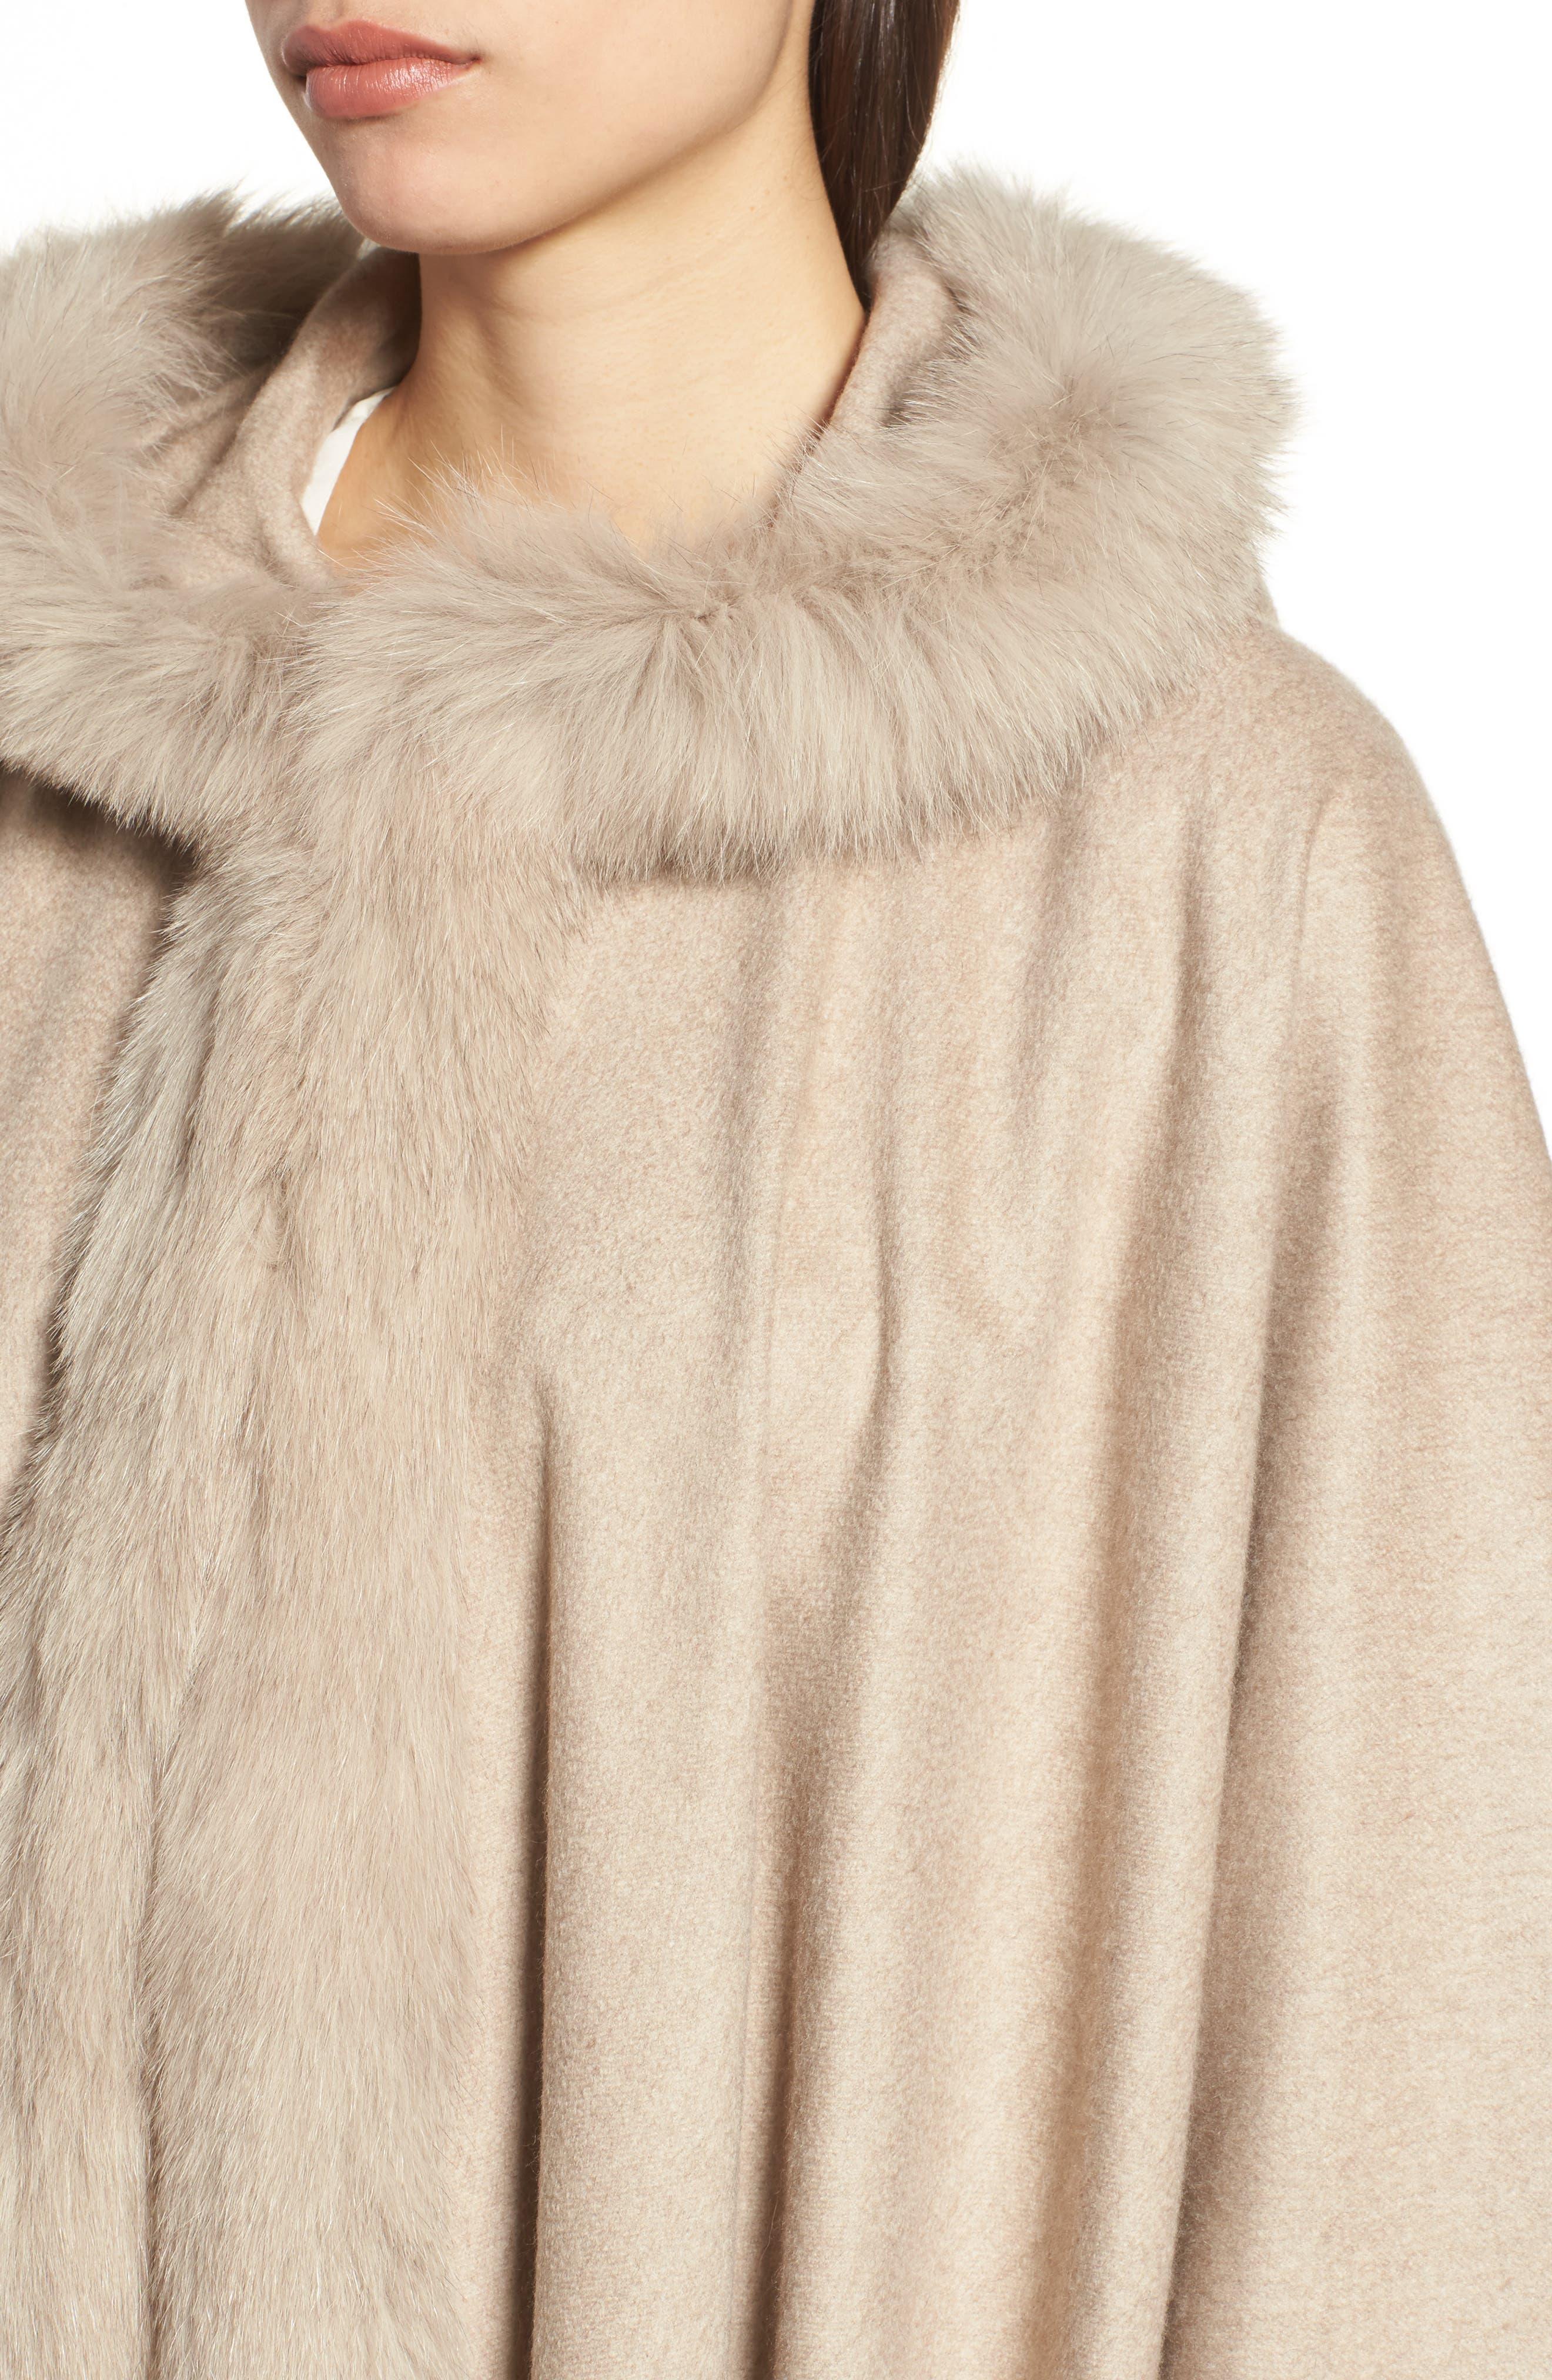 Alternate Image 4  - Max Mara Cashmere Hooded Cape with Genuine Fox Fur Trim